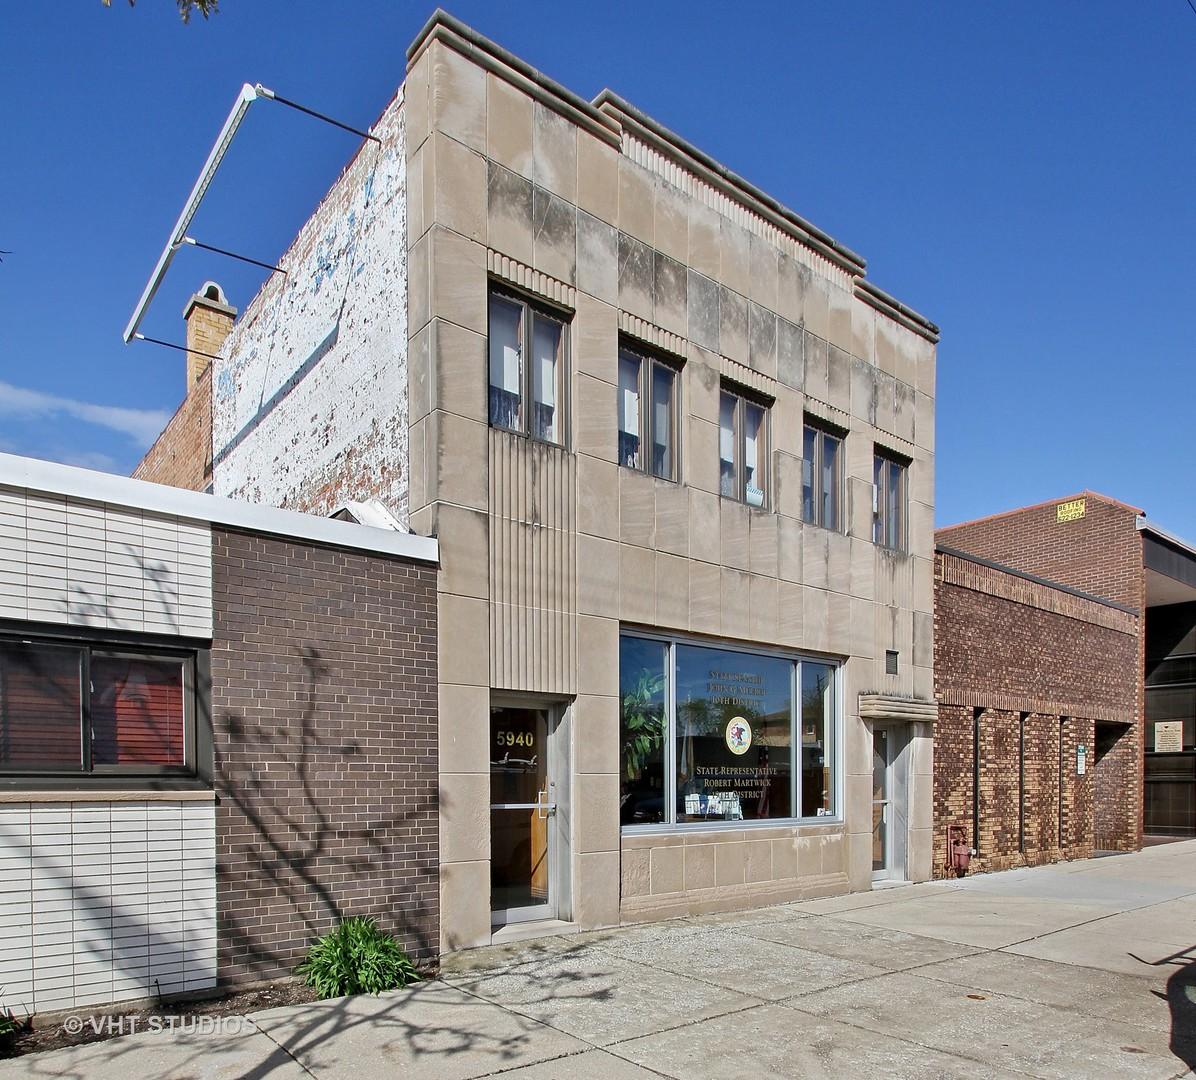 5940 N Milwaukee Avenue, Chicago, IL 60646